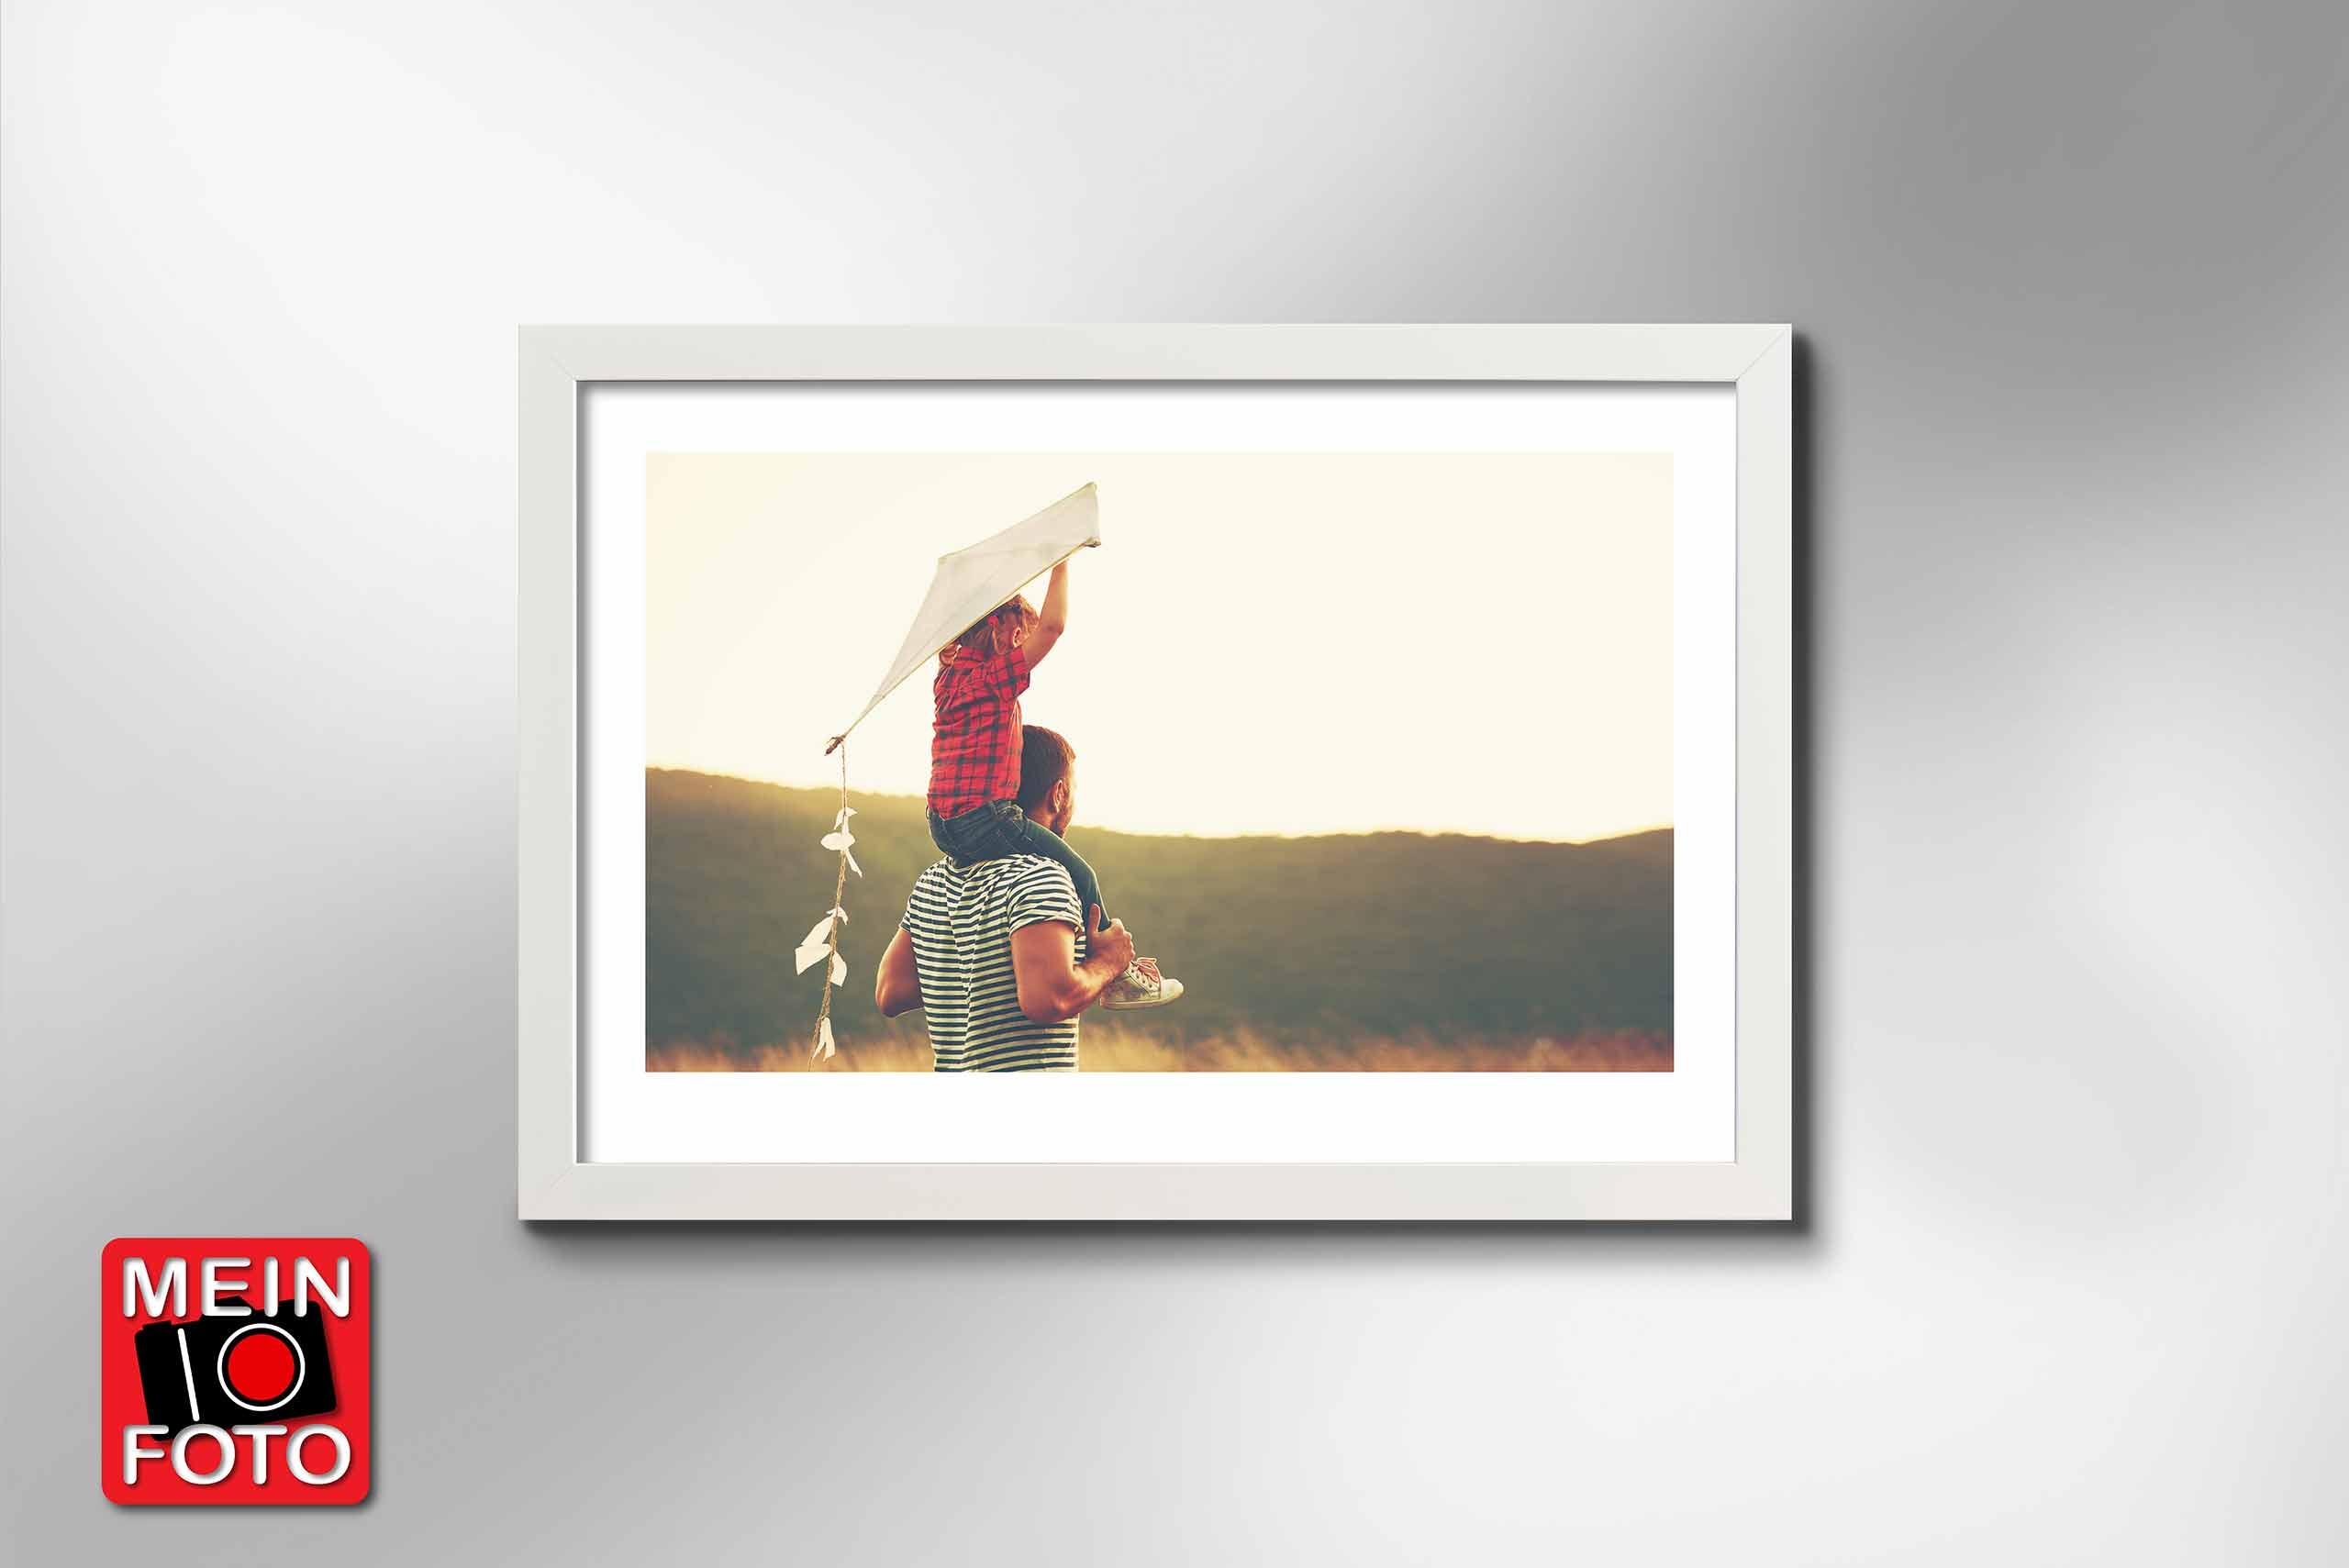 "Wandbild FINE ART WHITE 100x70cm Bilderrahmen Passepartout weiß Motiv ""Mein Foto"""